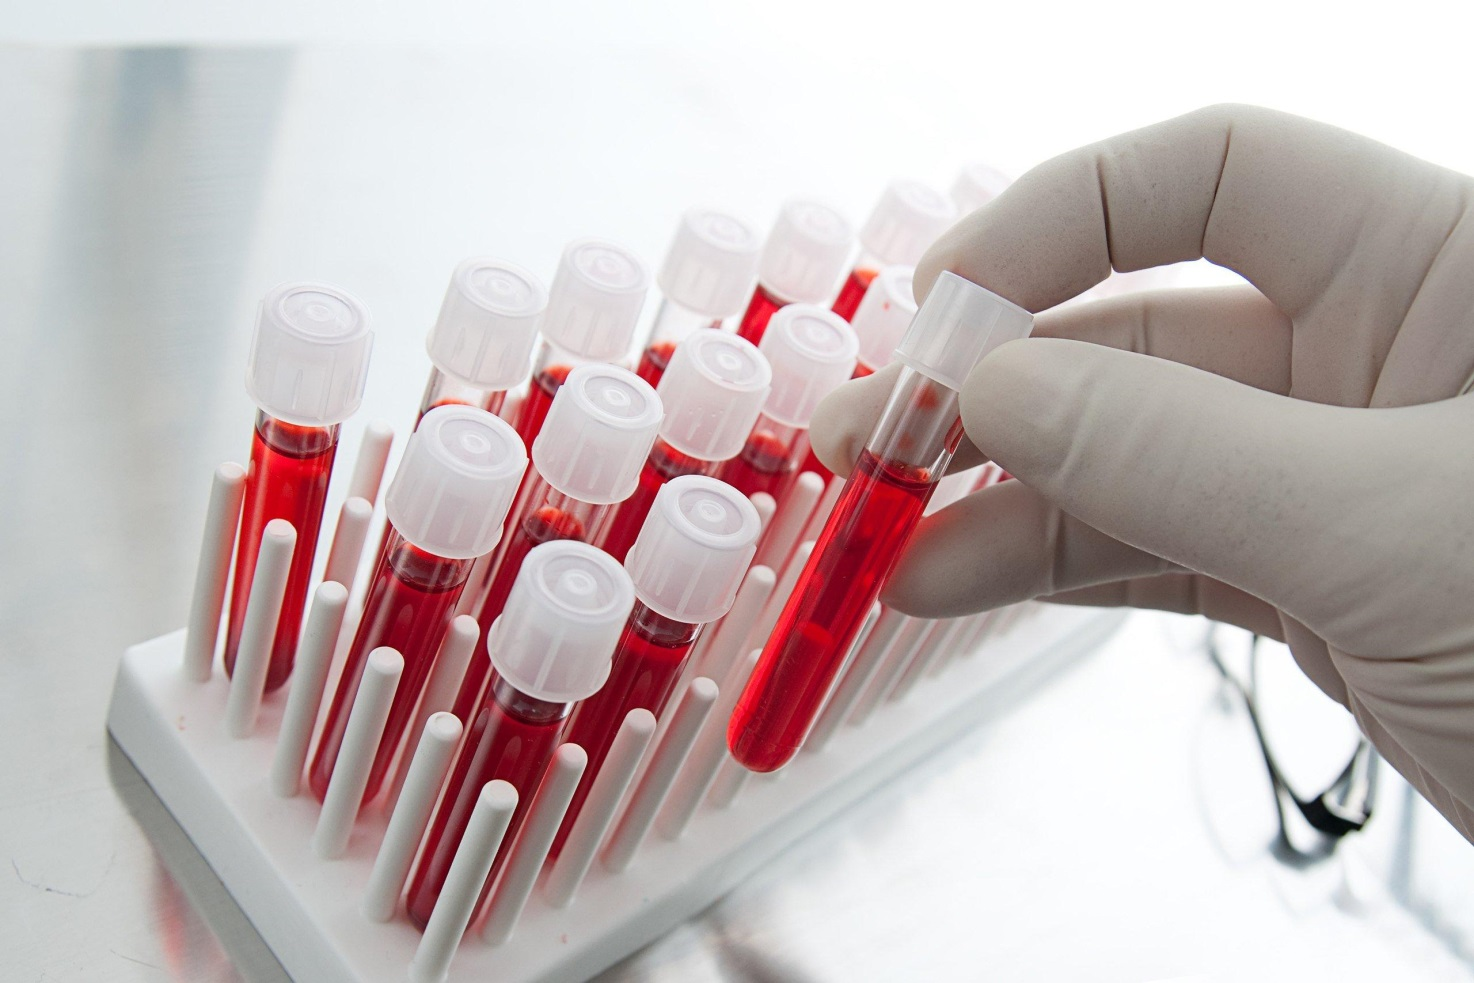 на фото изображен набор пробирок для крови для анализа